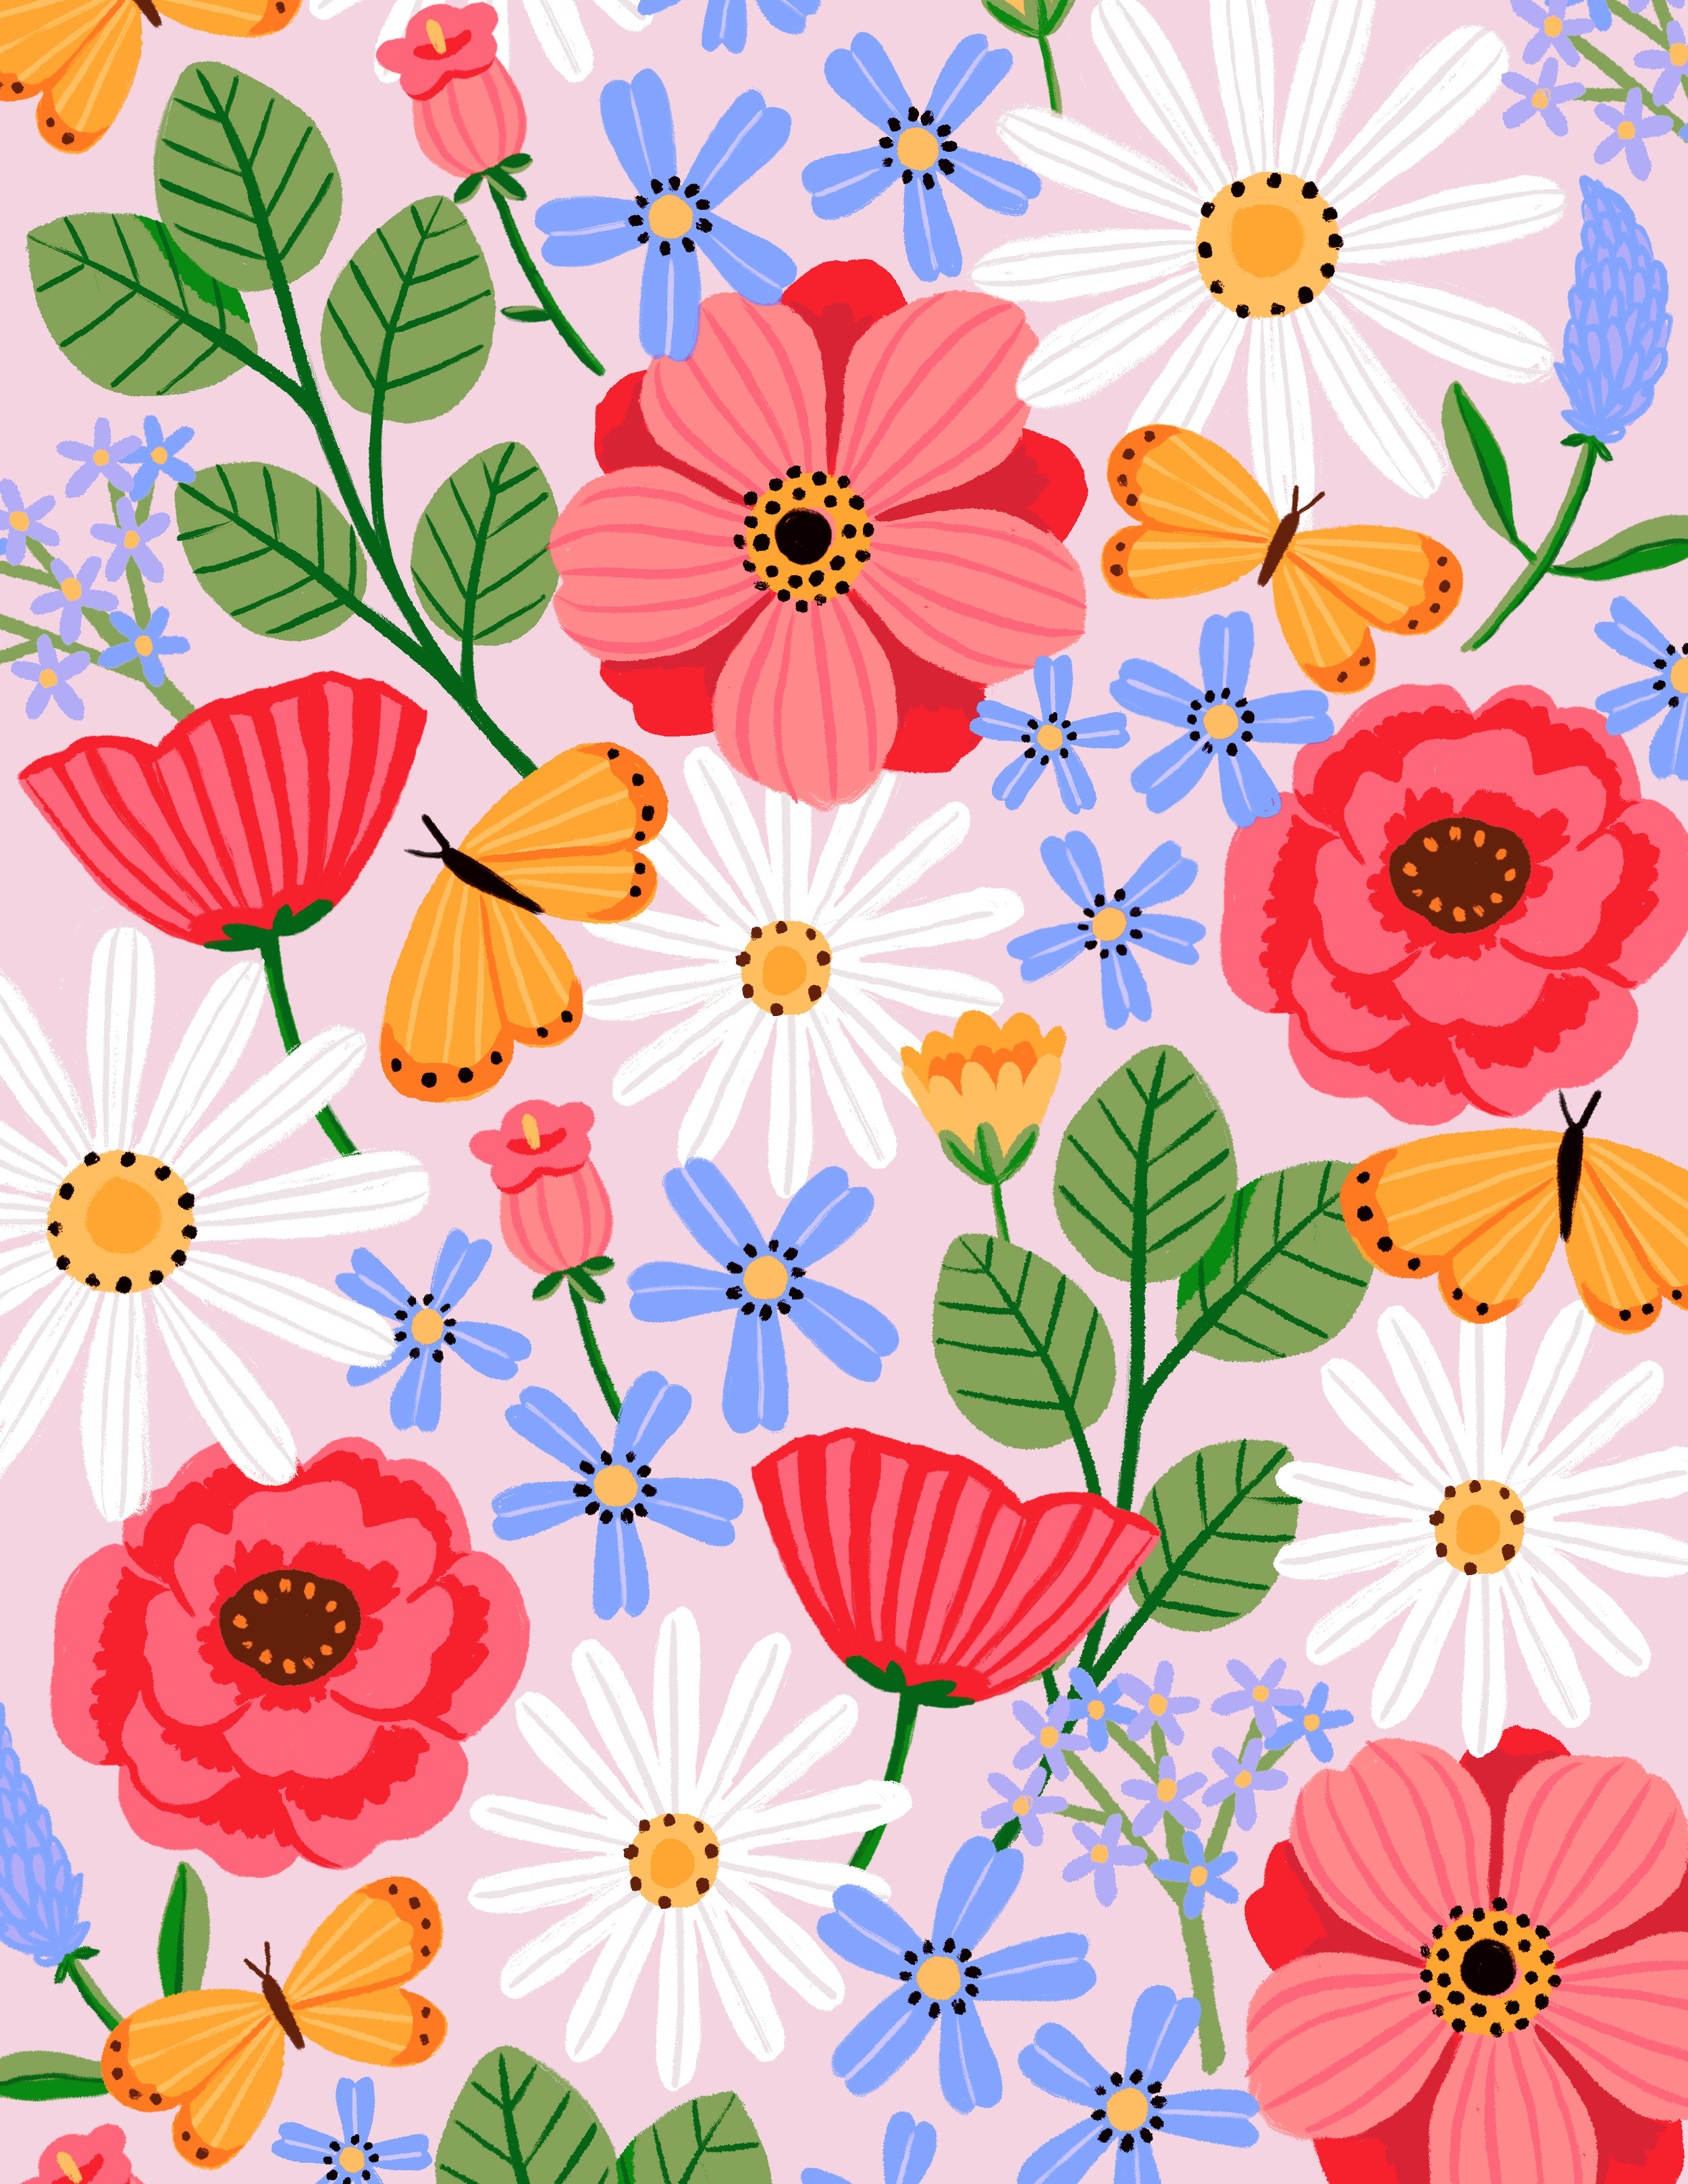 Floral_Invite Allover flat.jpg